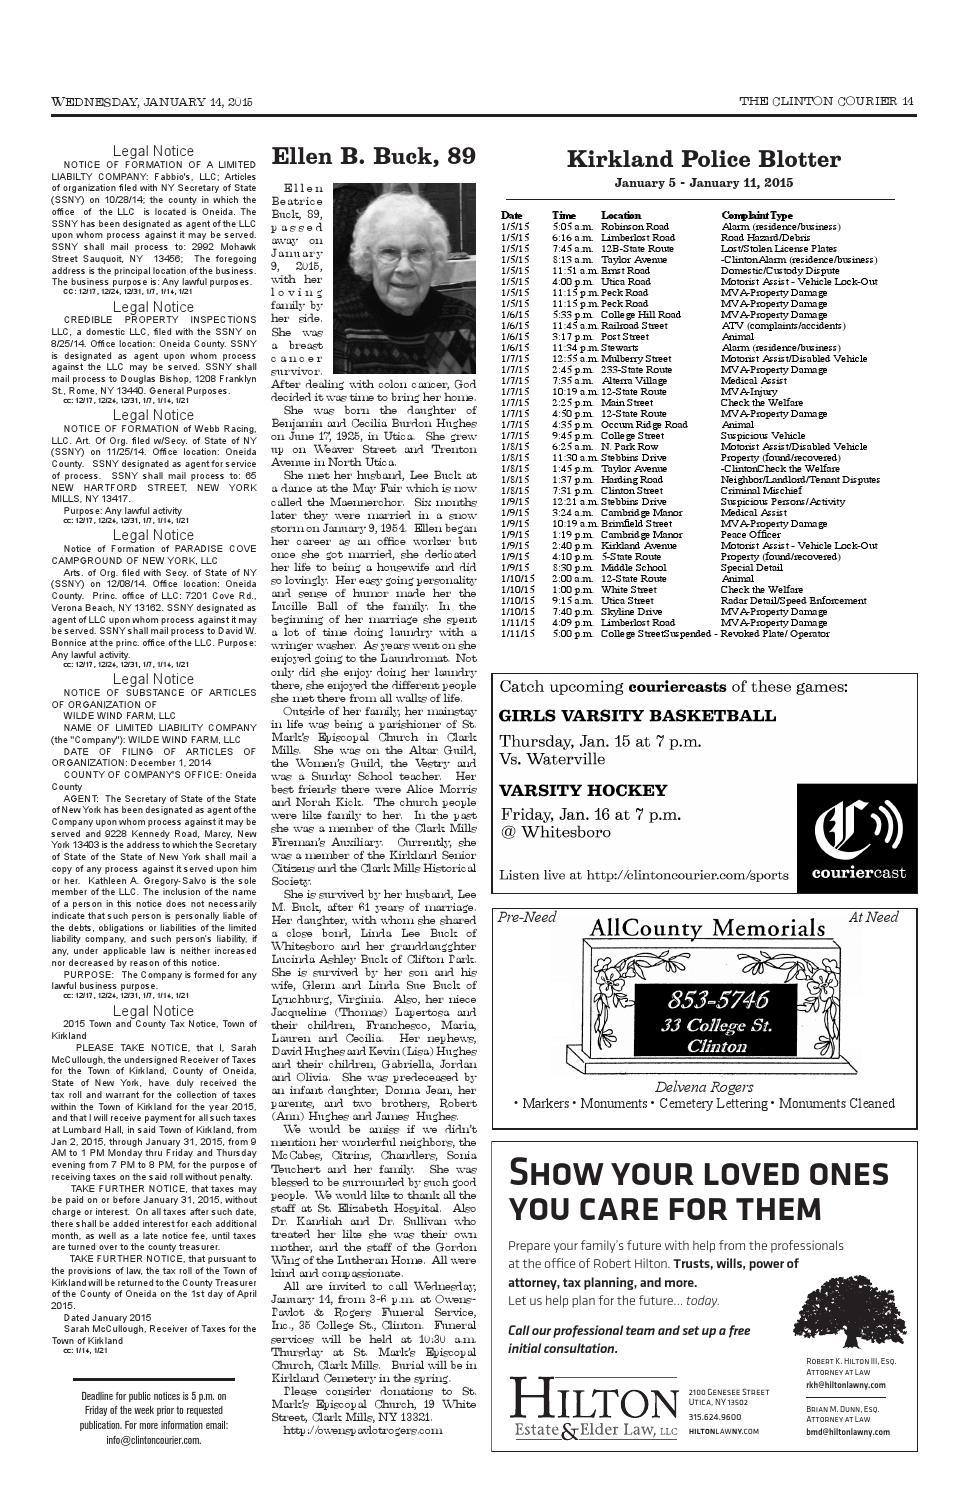 2014 oneida county tax rolls - 2014 Oneida County Tax Rolls 22